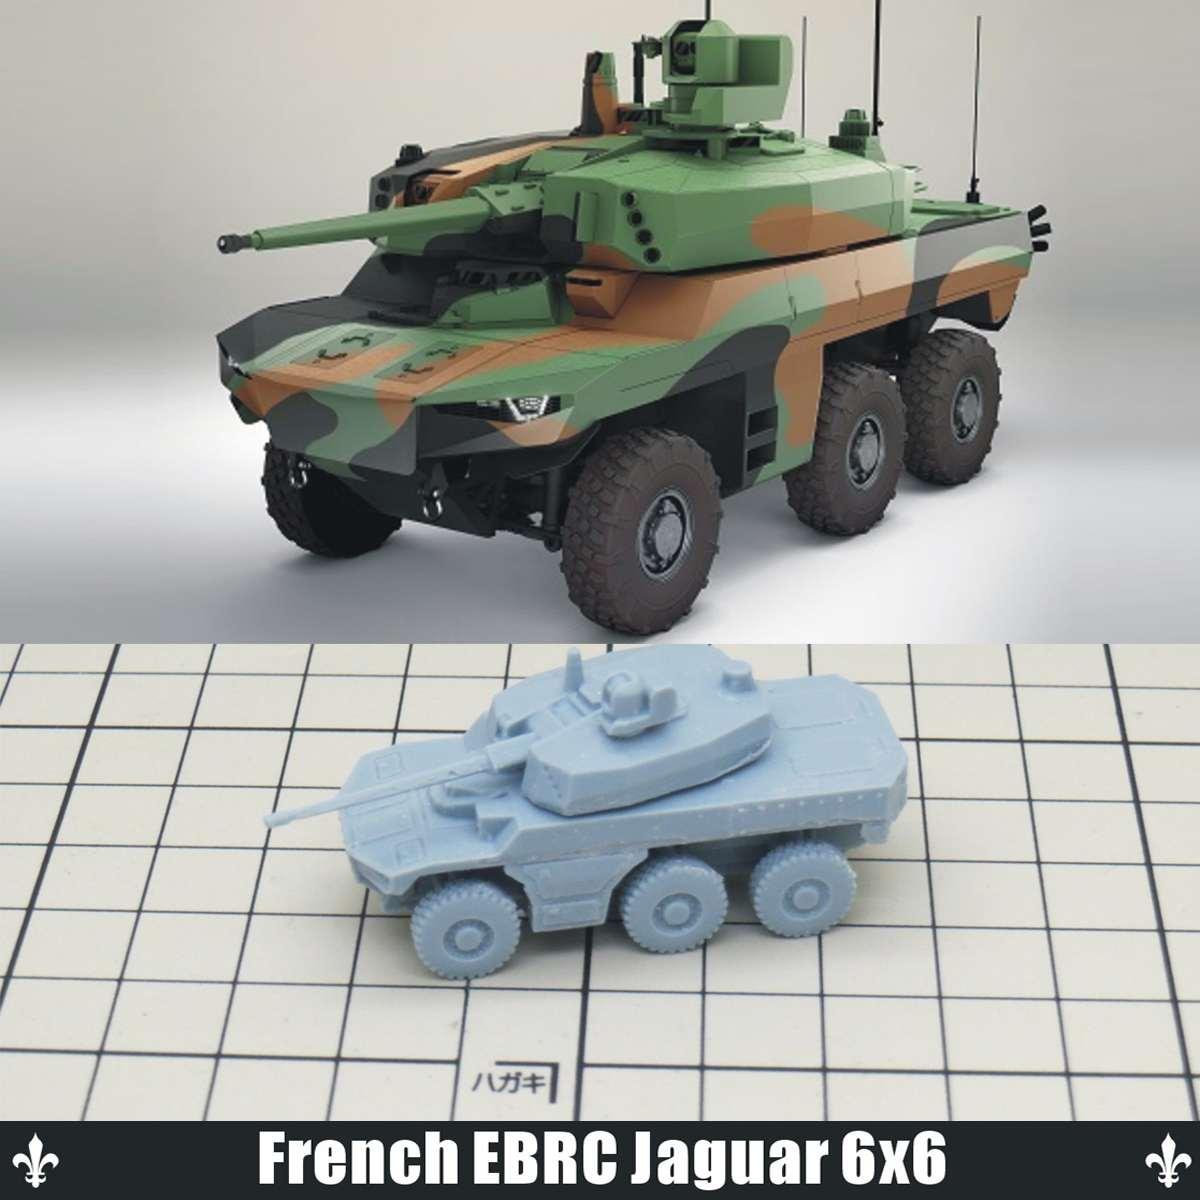 1/144 Diy Hars Beeldjes Wwii Ferman Voertuigen Auto Auto Tank Serie Diy Militaire Zand Tafel Model Ornamenten Kids Gift 3d Speelgoed